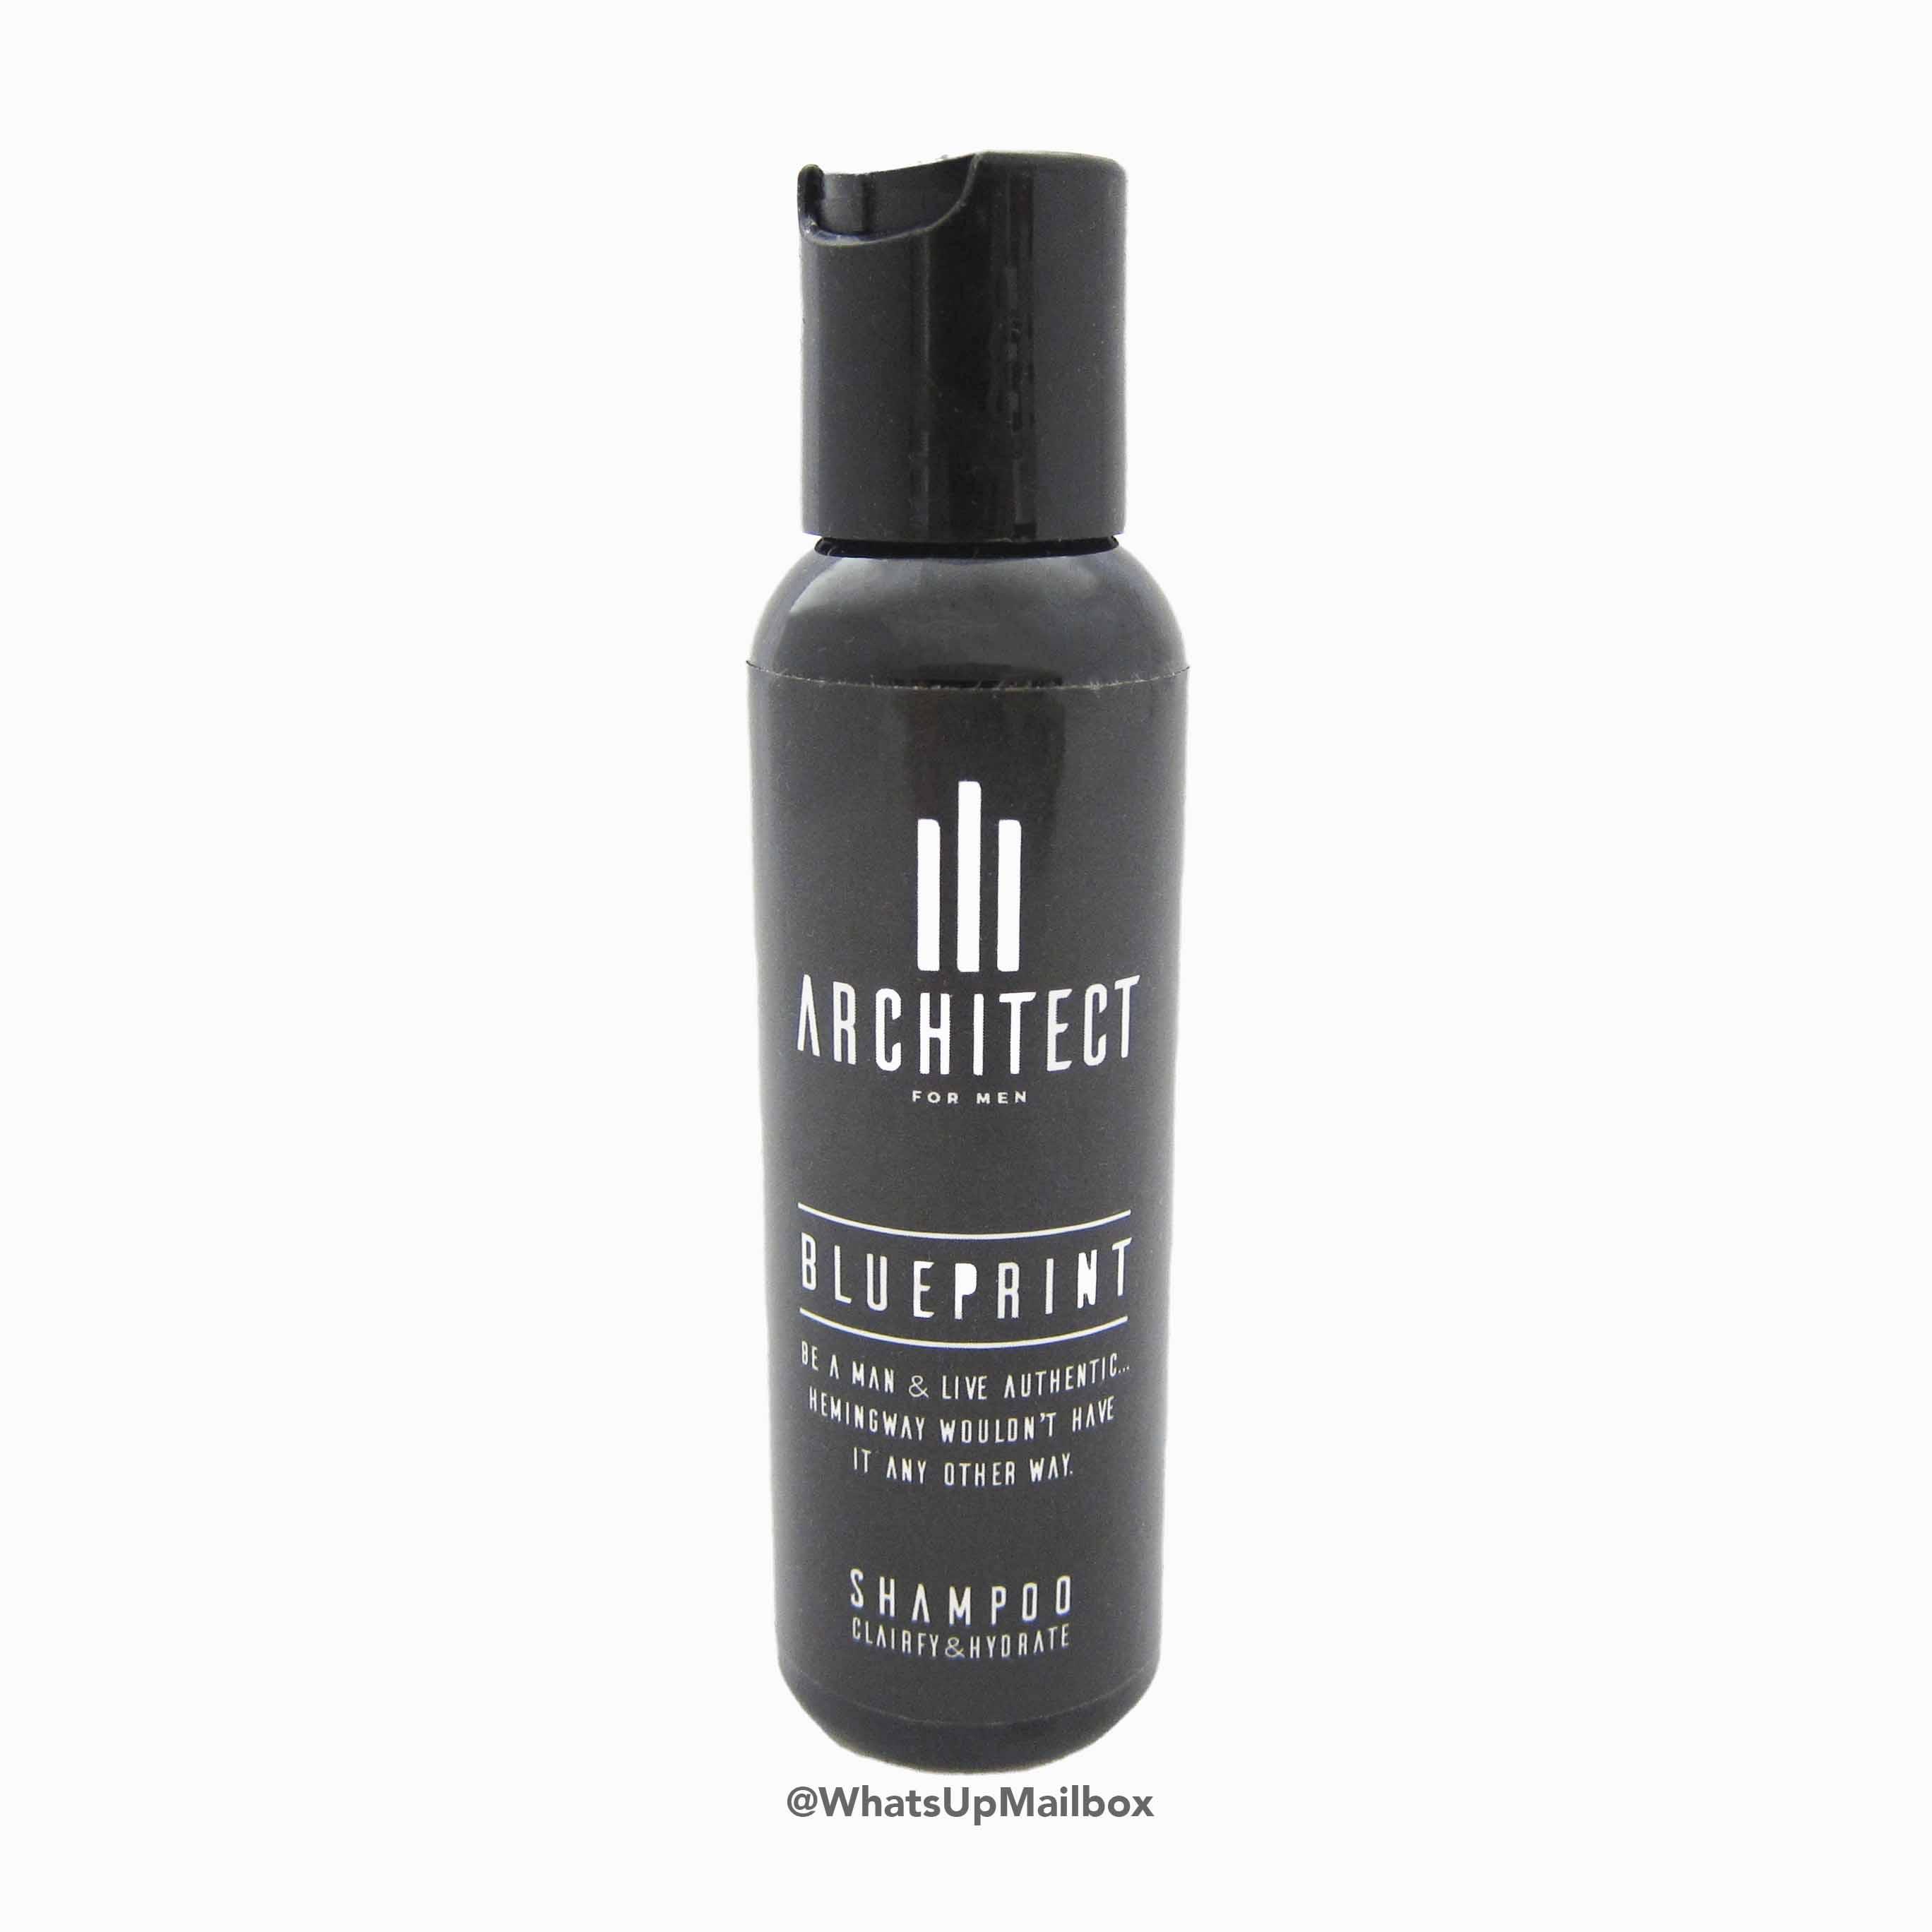 Architect For Men Shampoo